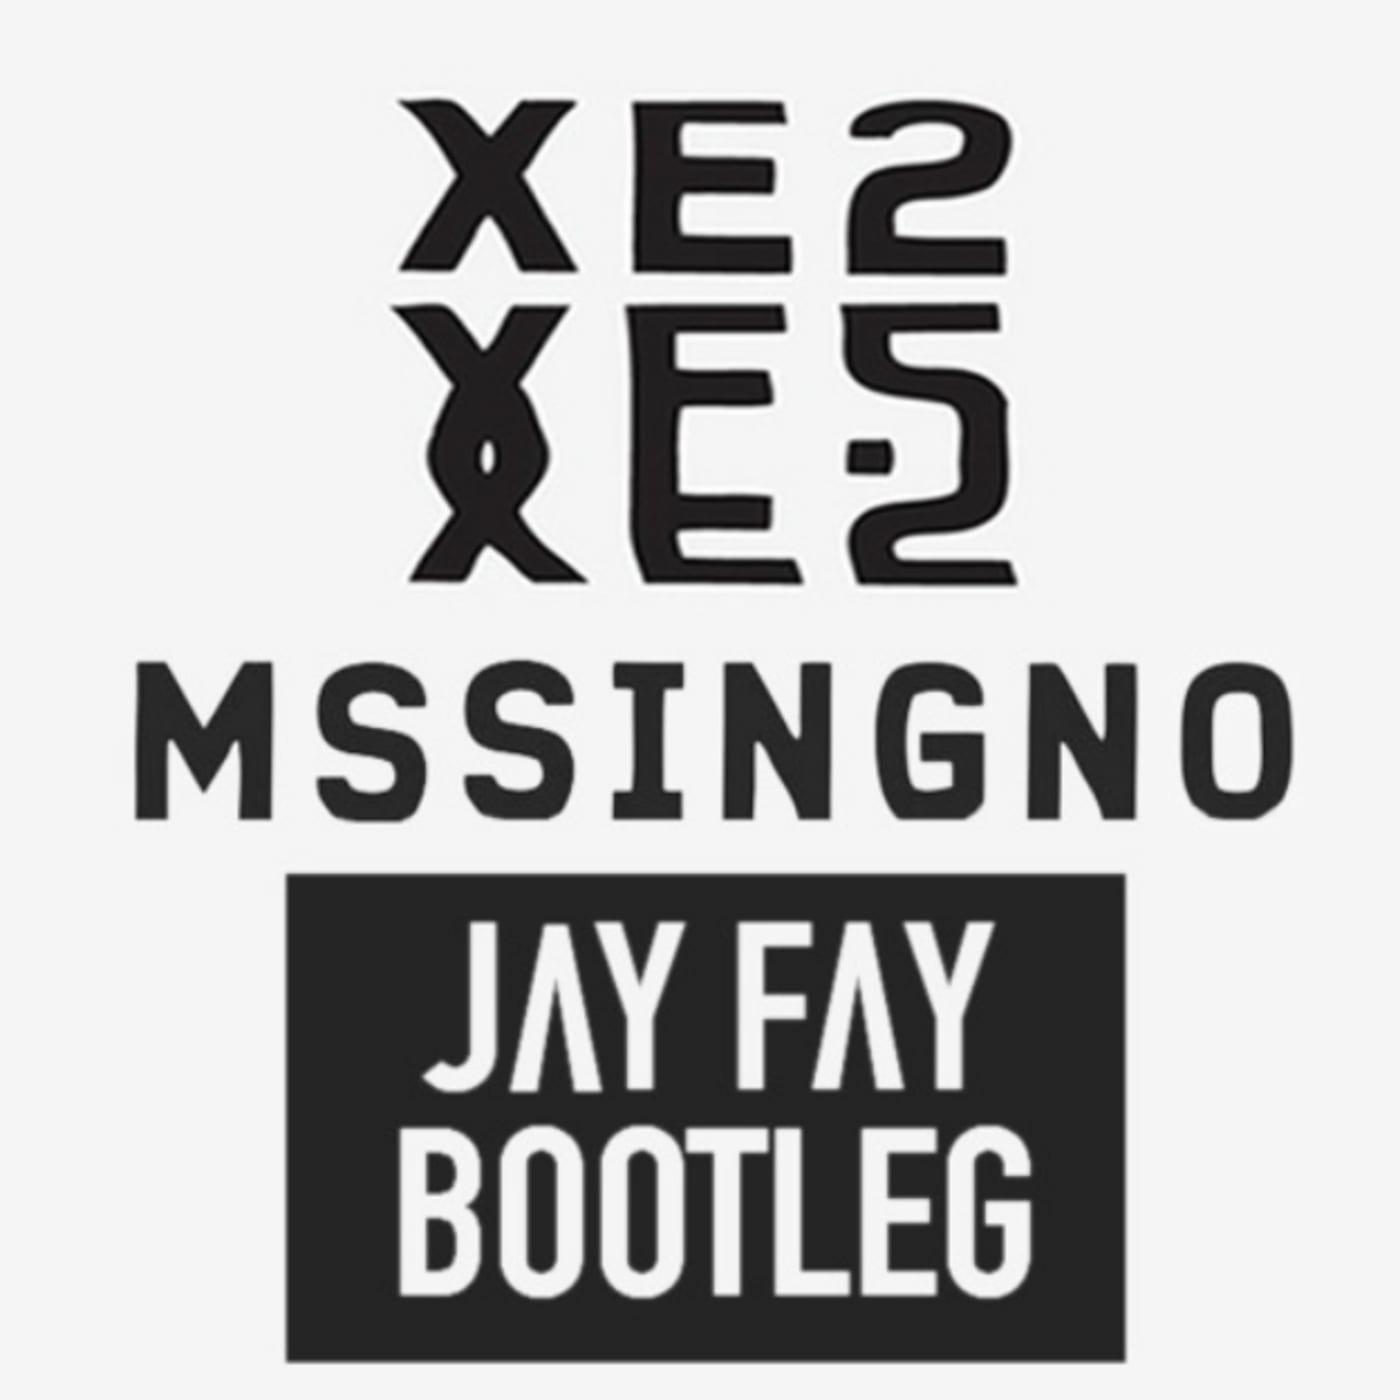 xe2 jay fay bootleg